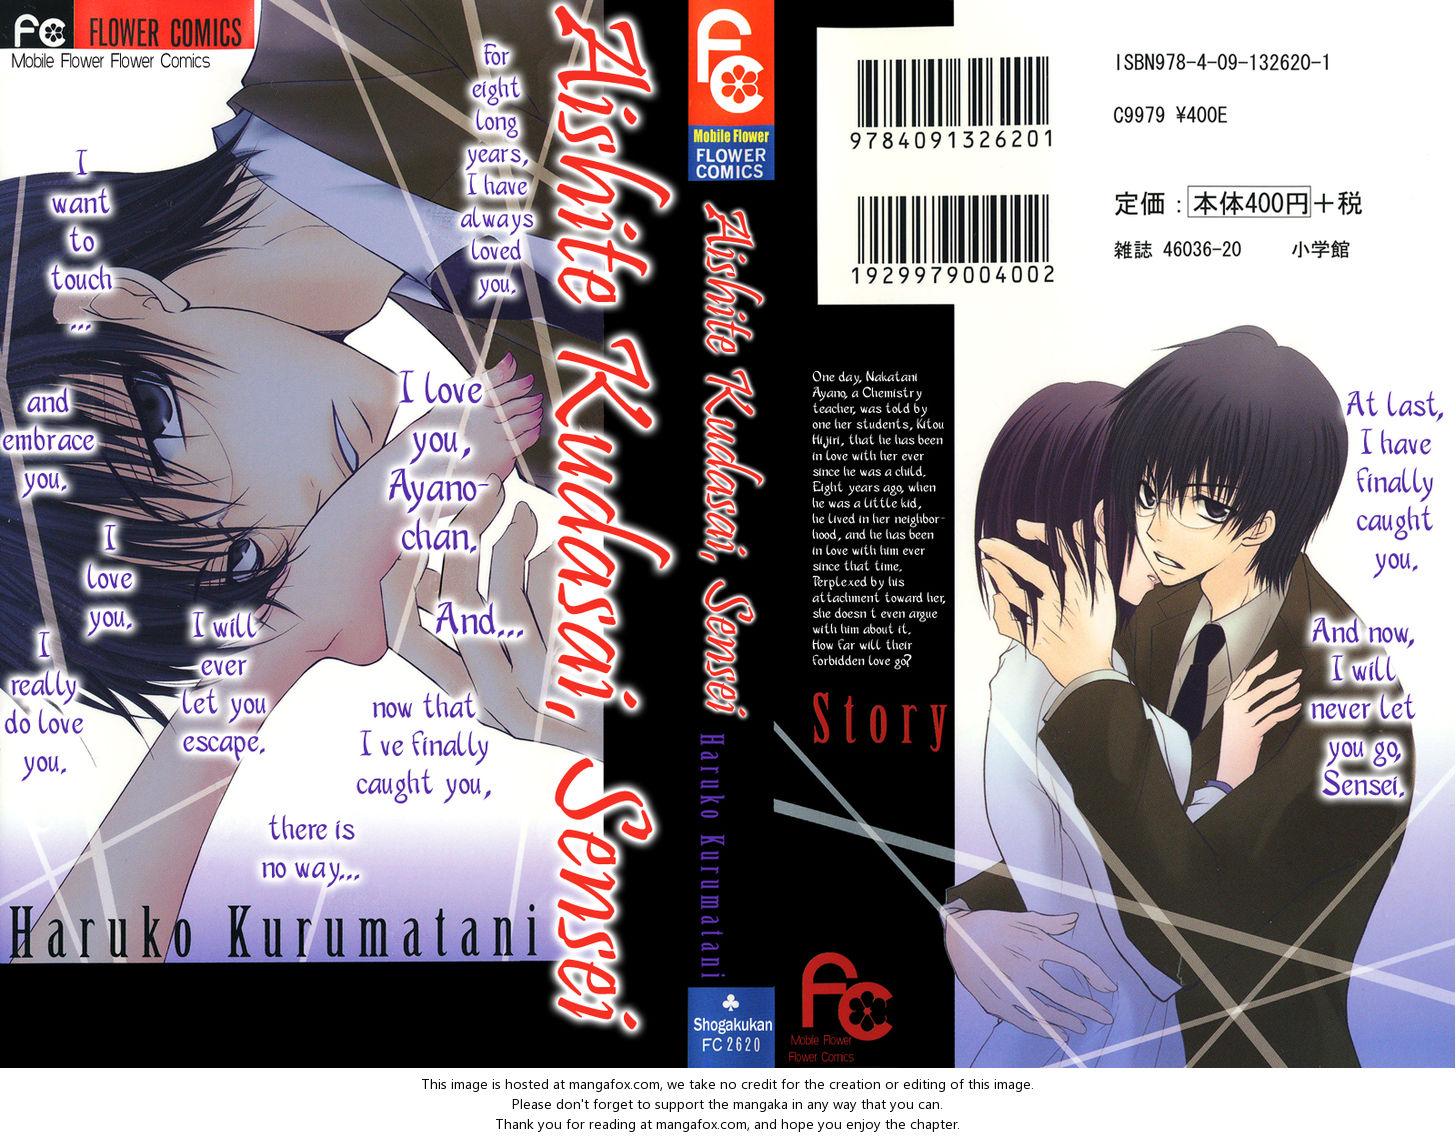 The Fantasy Library: Qiara's Top 5 Male Yandere Manga